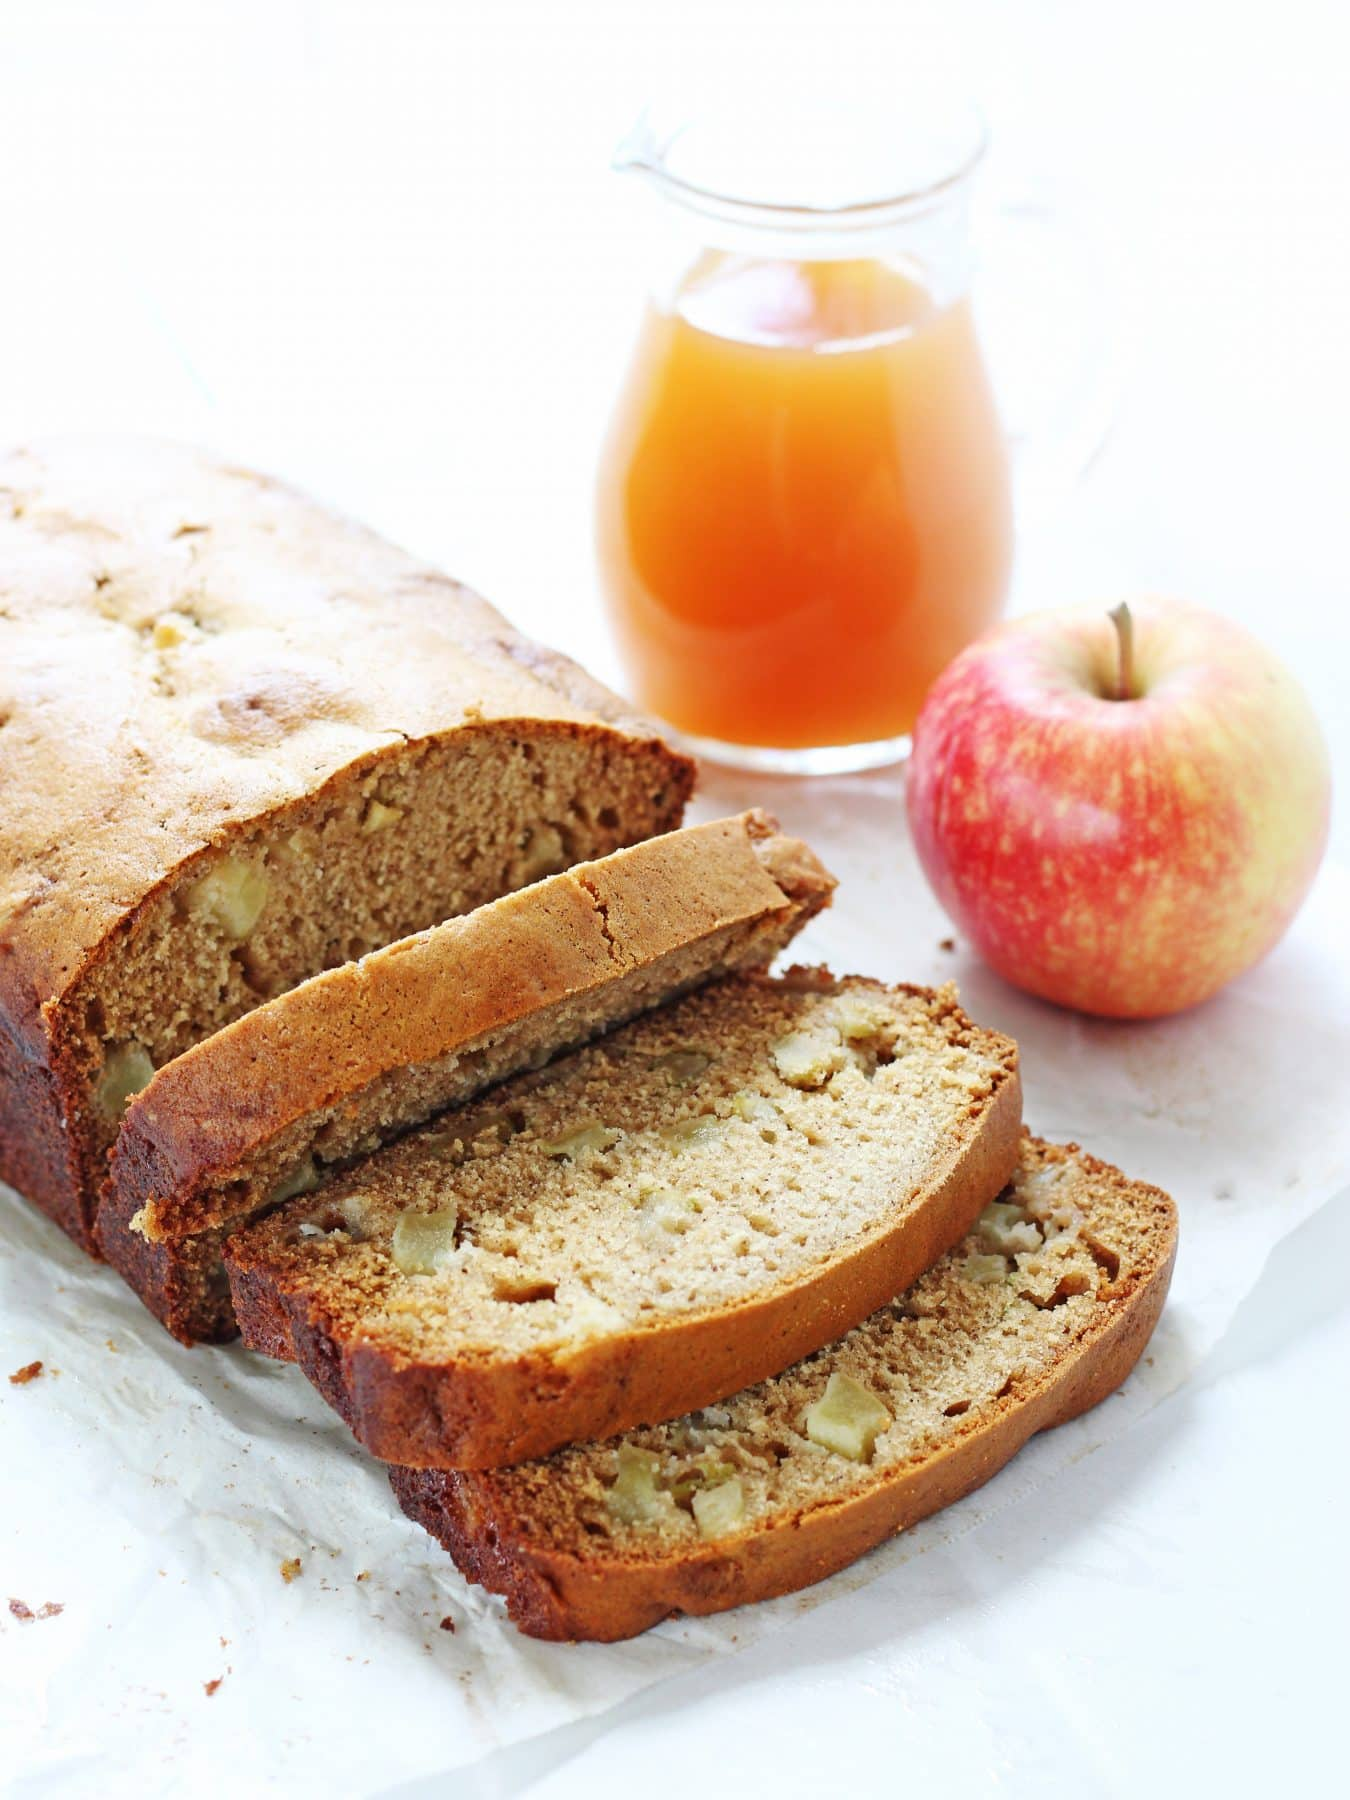 Apple Cider Bread 8.2016